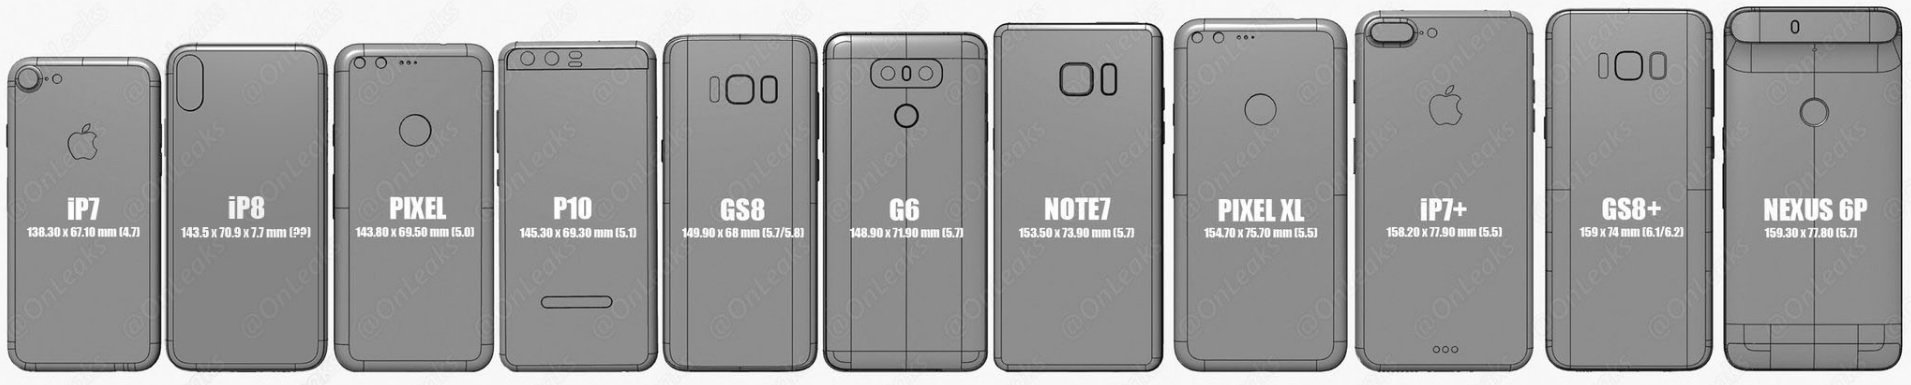 Wymiary iphone 7 plus